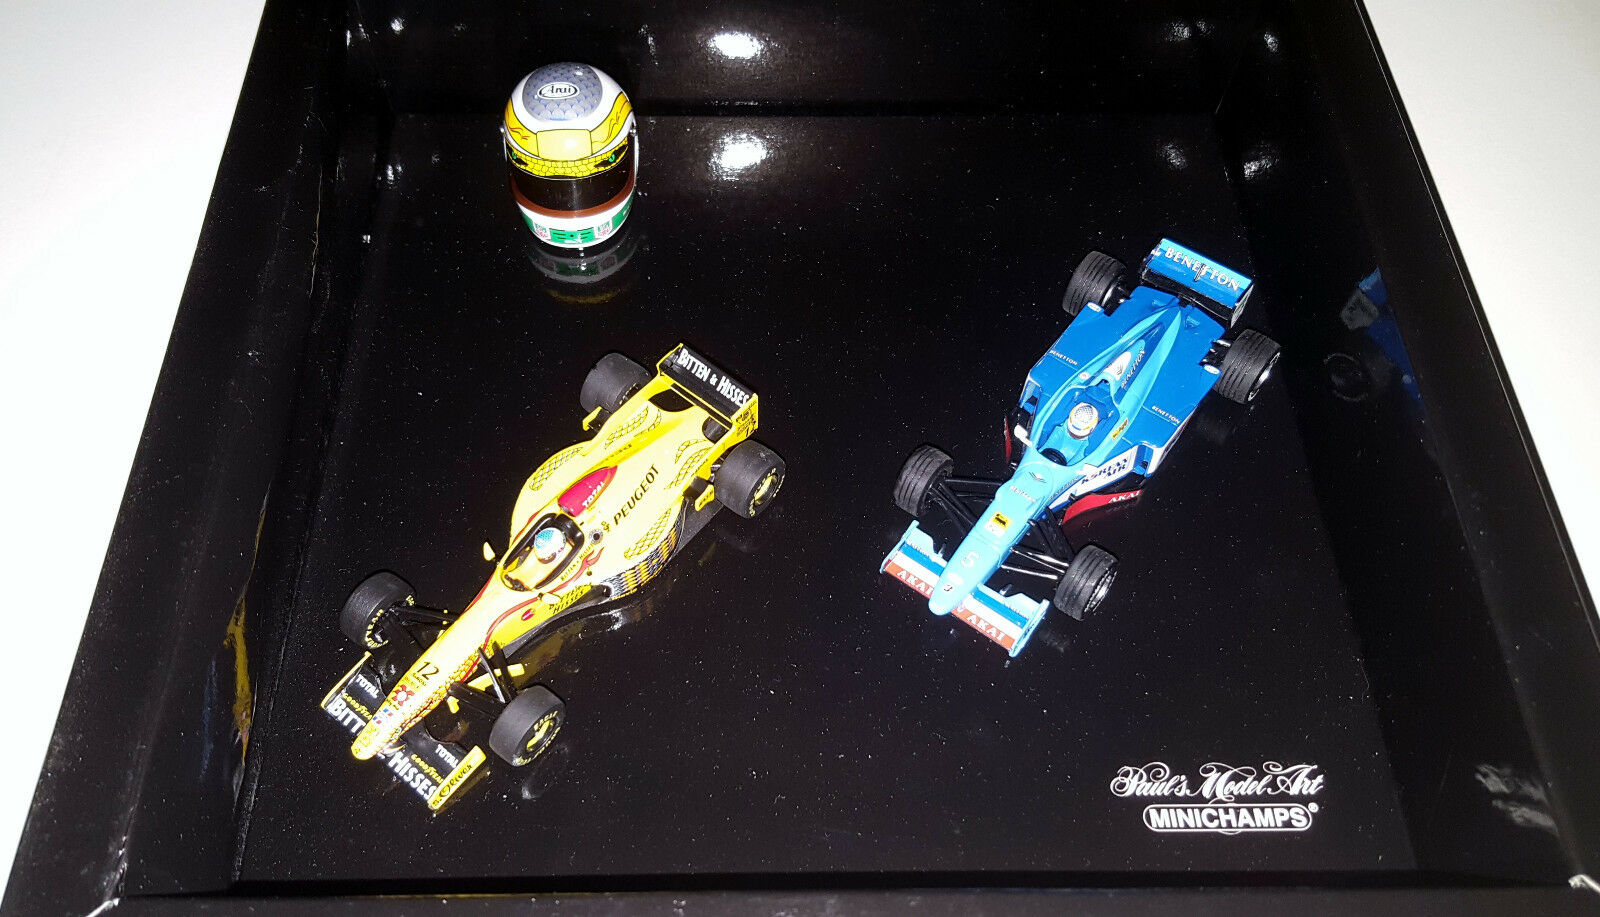 Minichamps 431000004 1  43 Gianbillo Fisichella Jordan 197 Benetton B198 Helmet